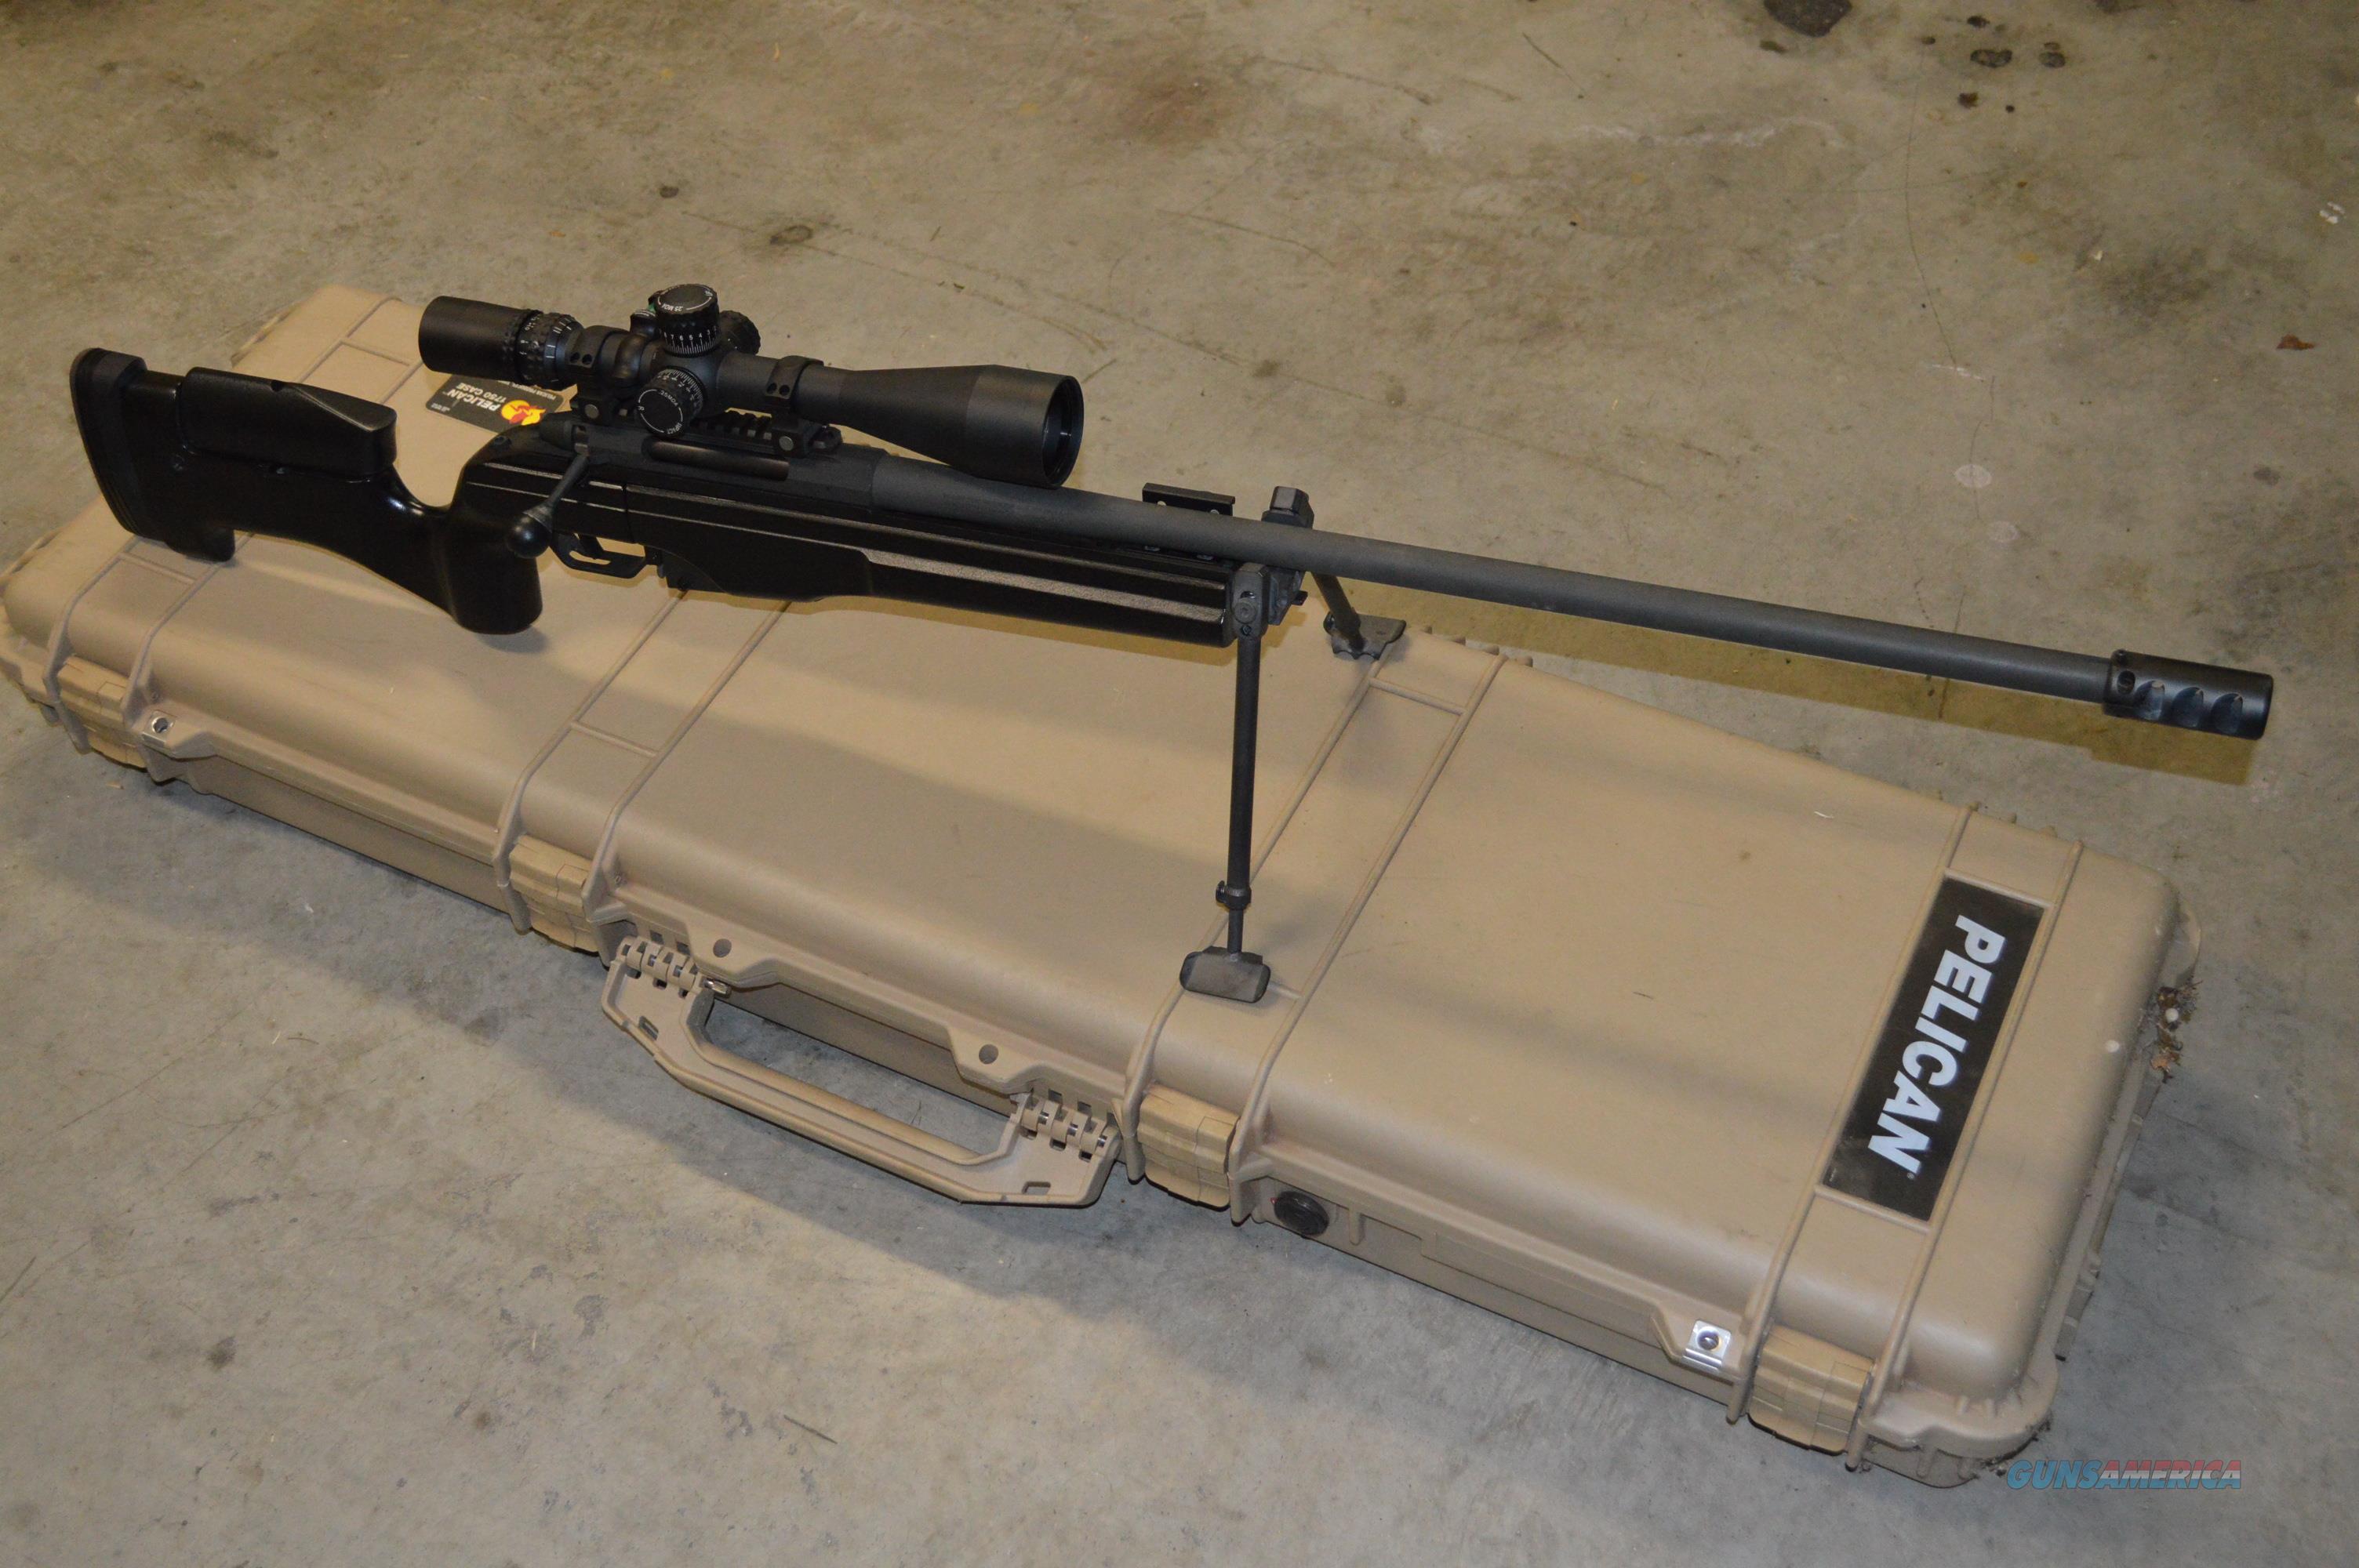 Sako TRG-42 338 Lapua + Nightforce NXS + Extras  Guns > Rifles > Sako Rifles > Other Bolt Action